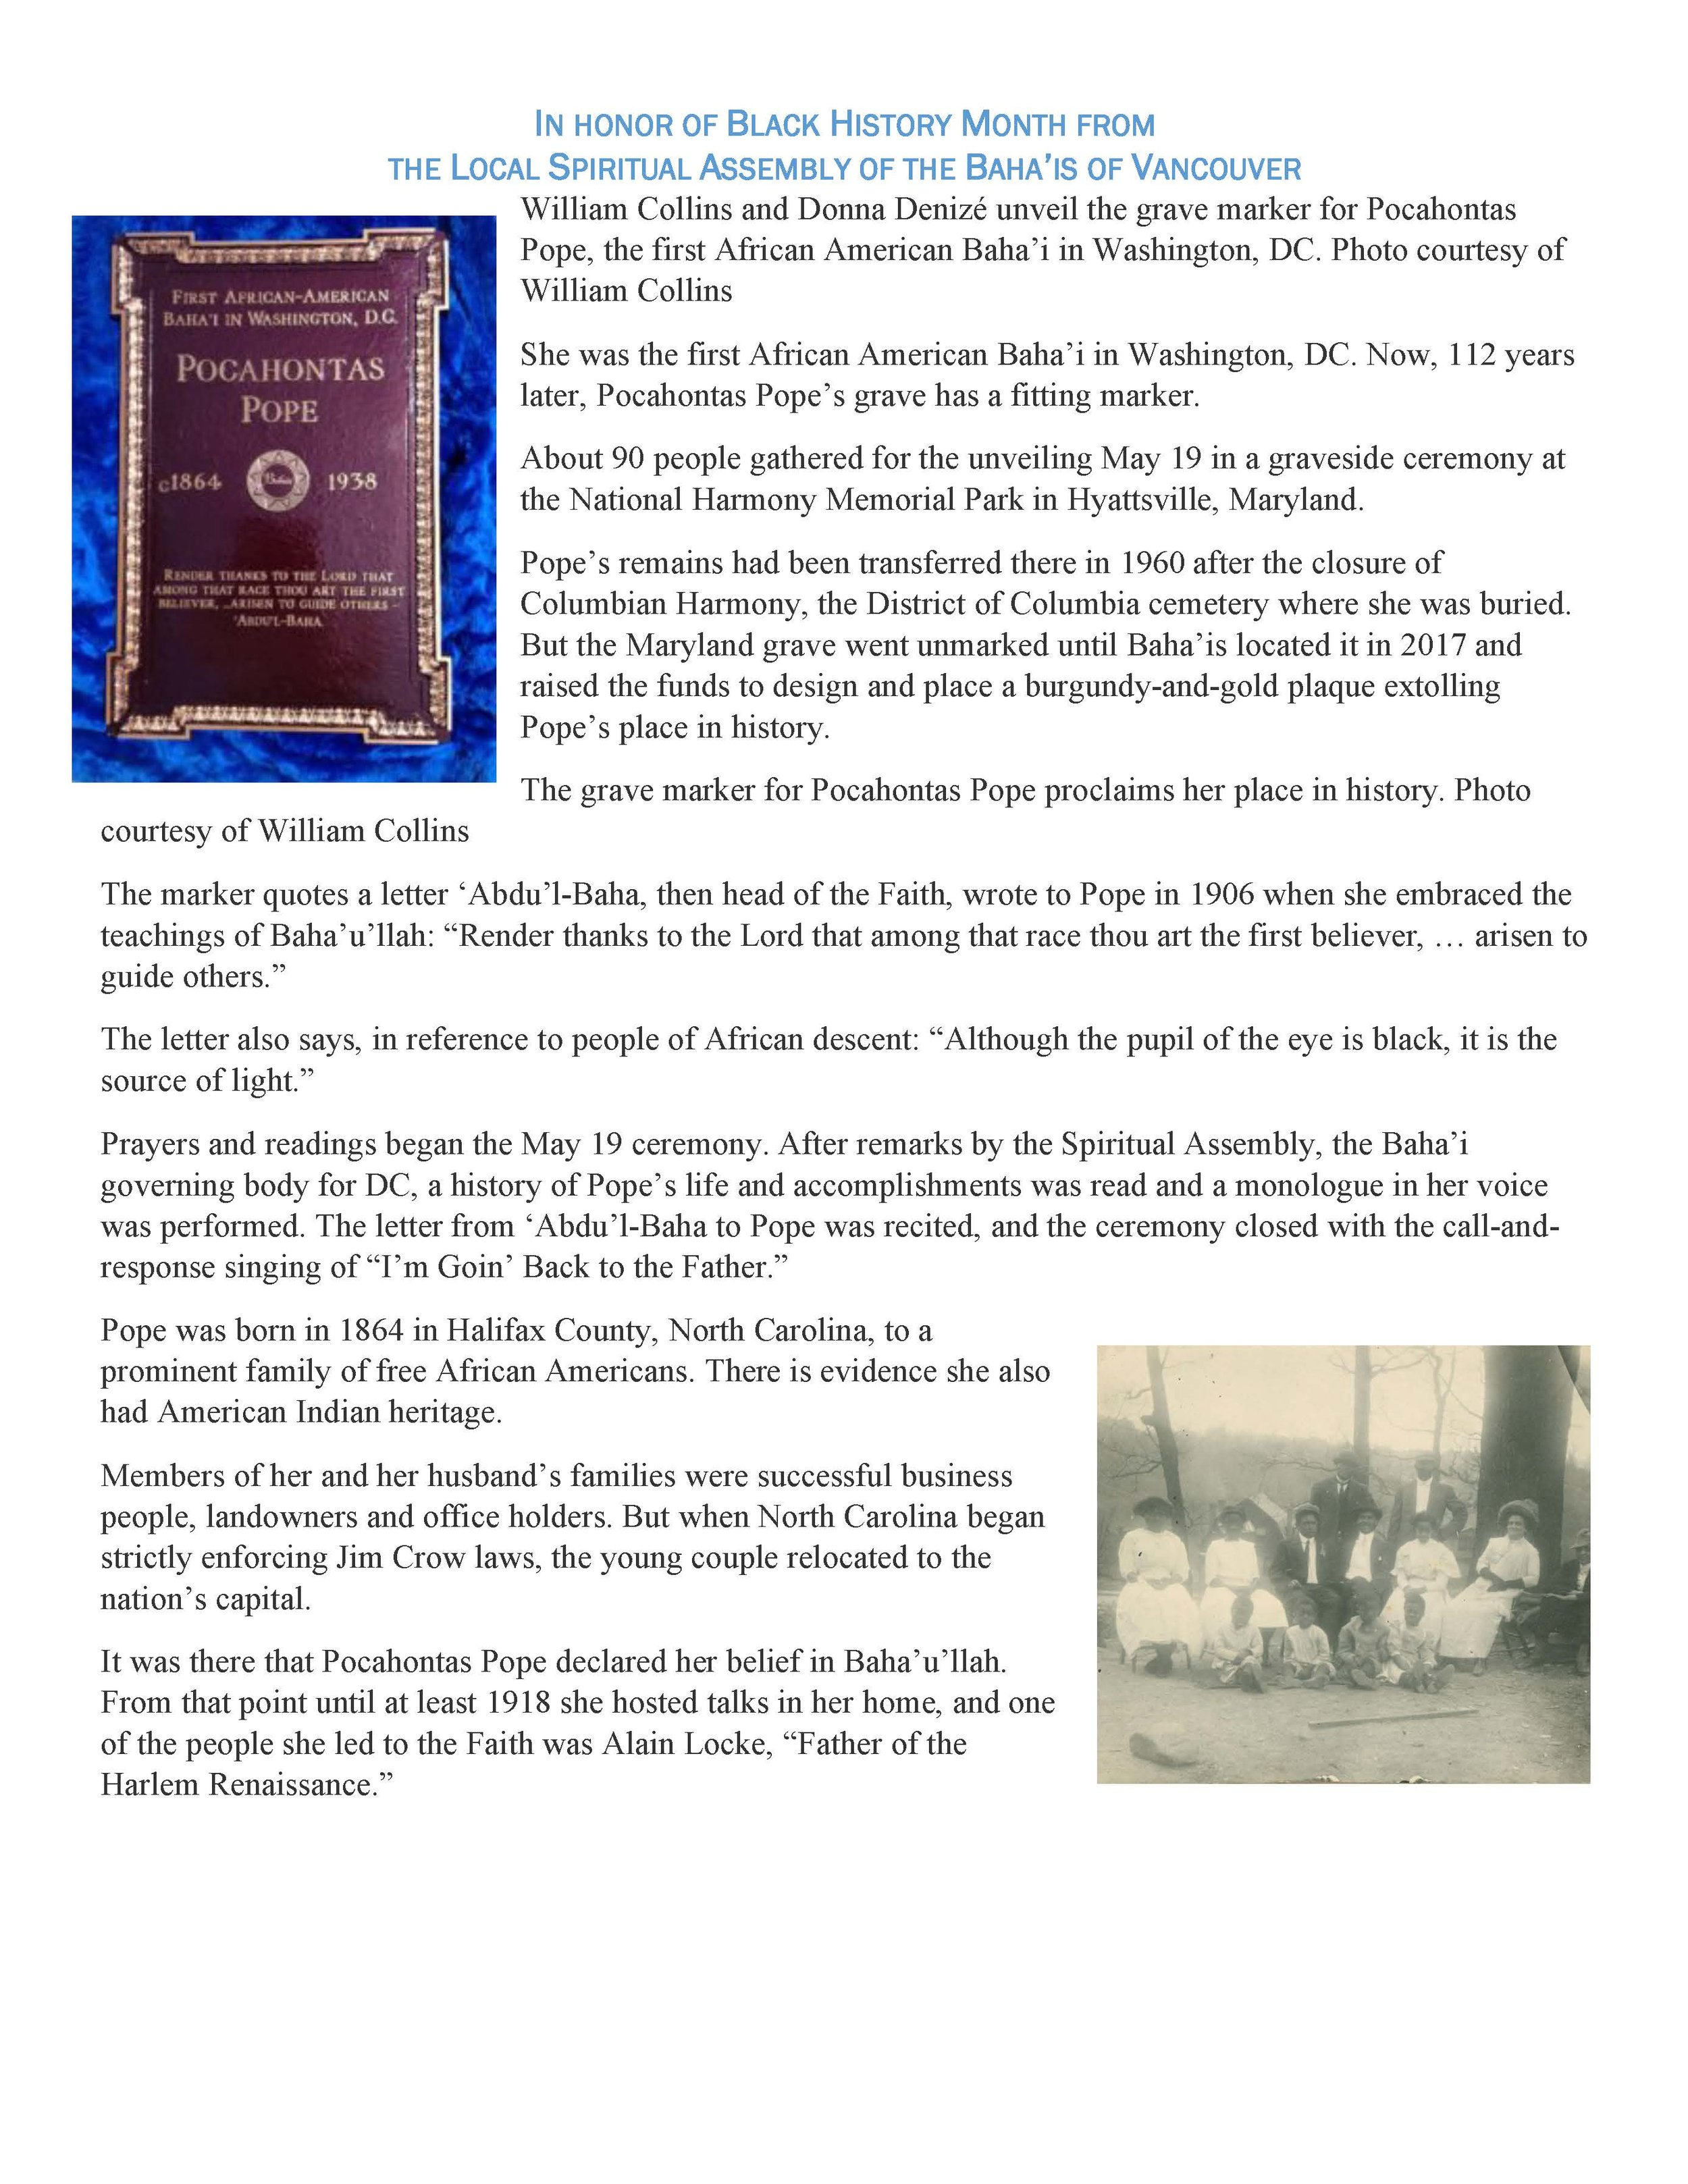 BlackHistory Monthjpeg_Page_2.jpg